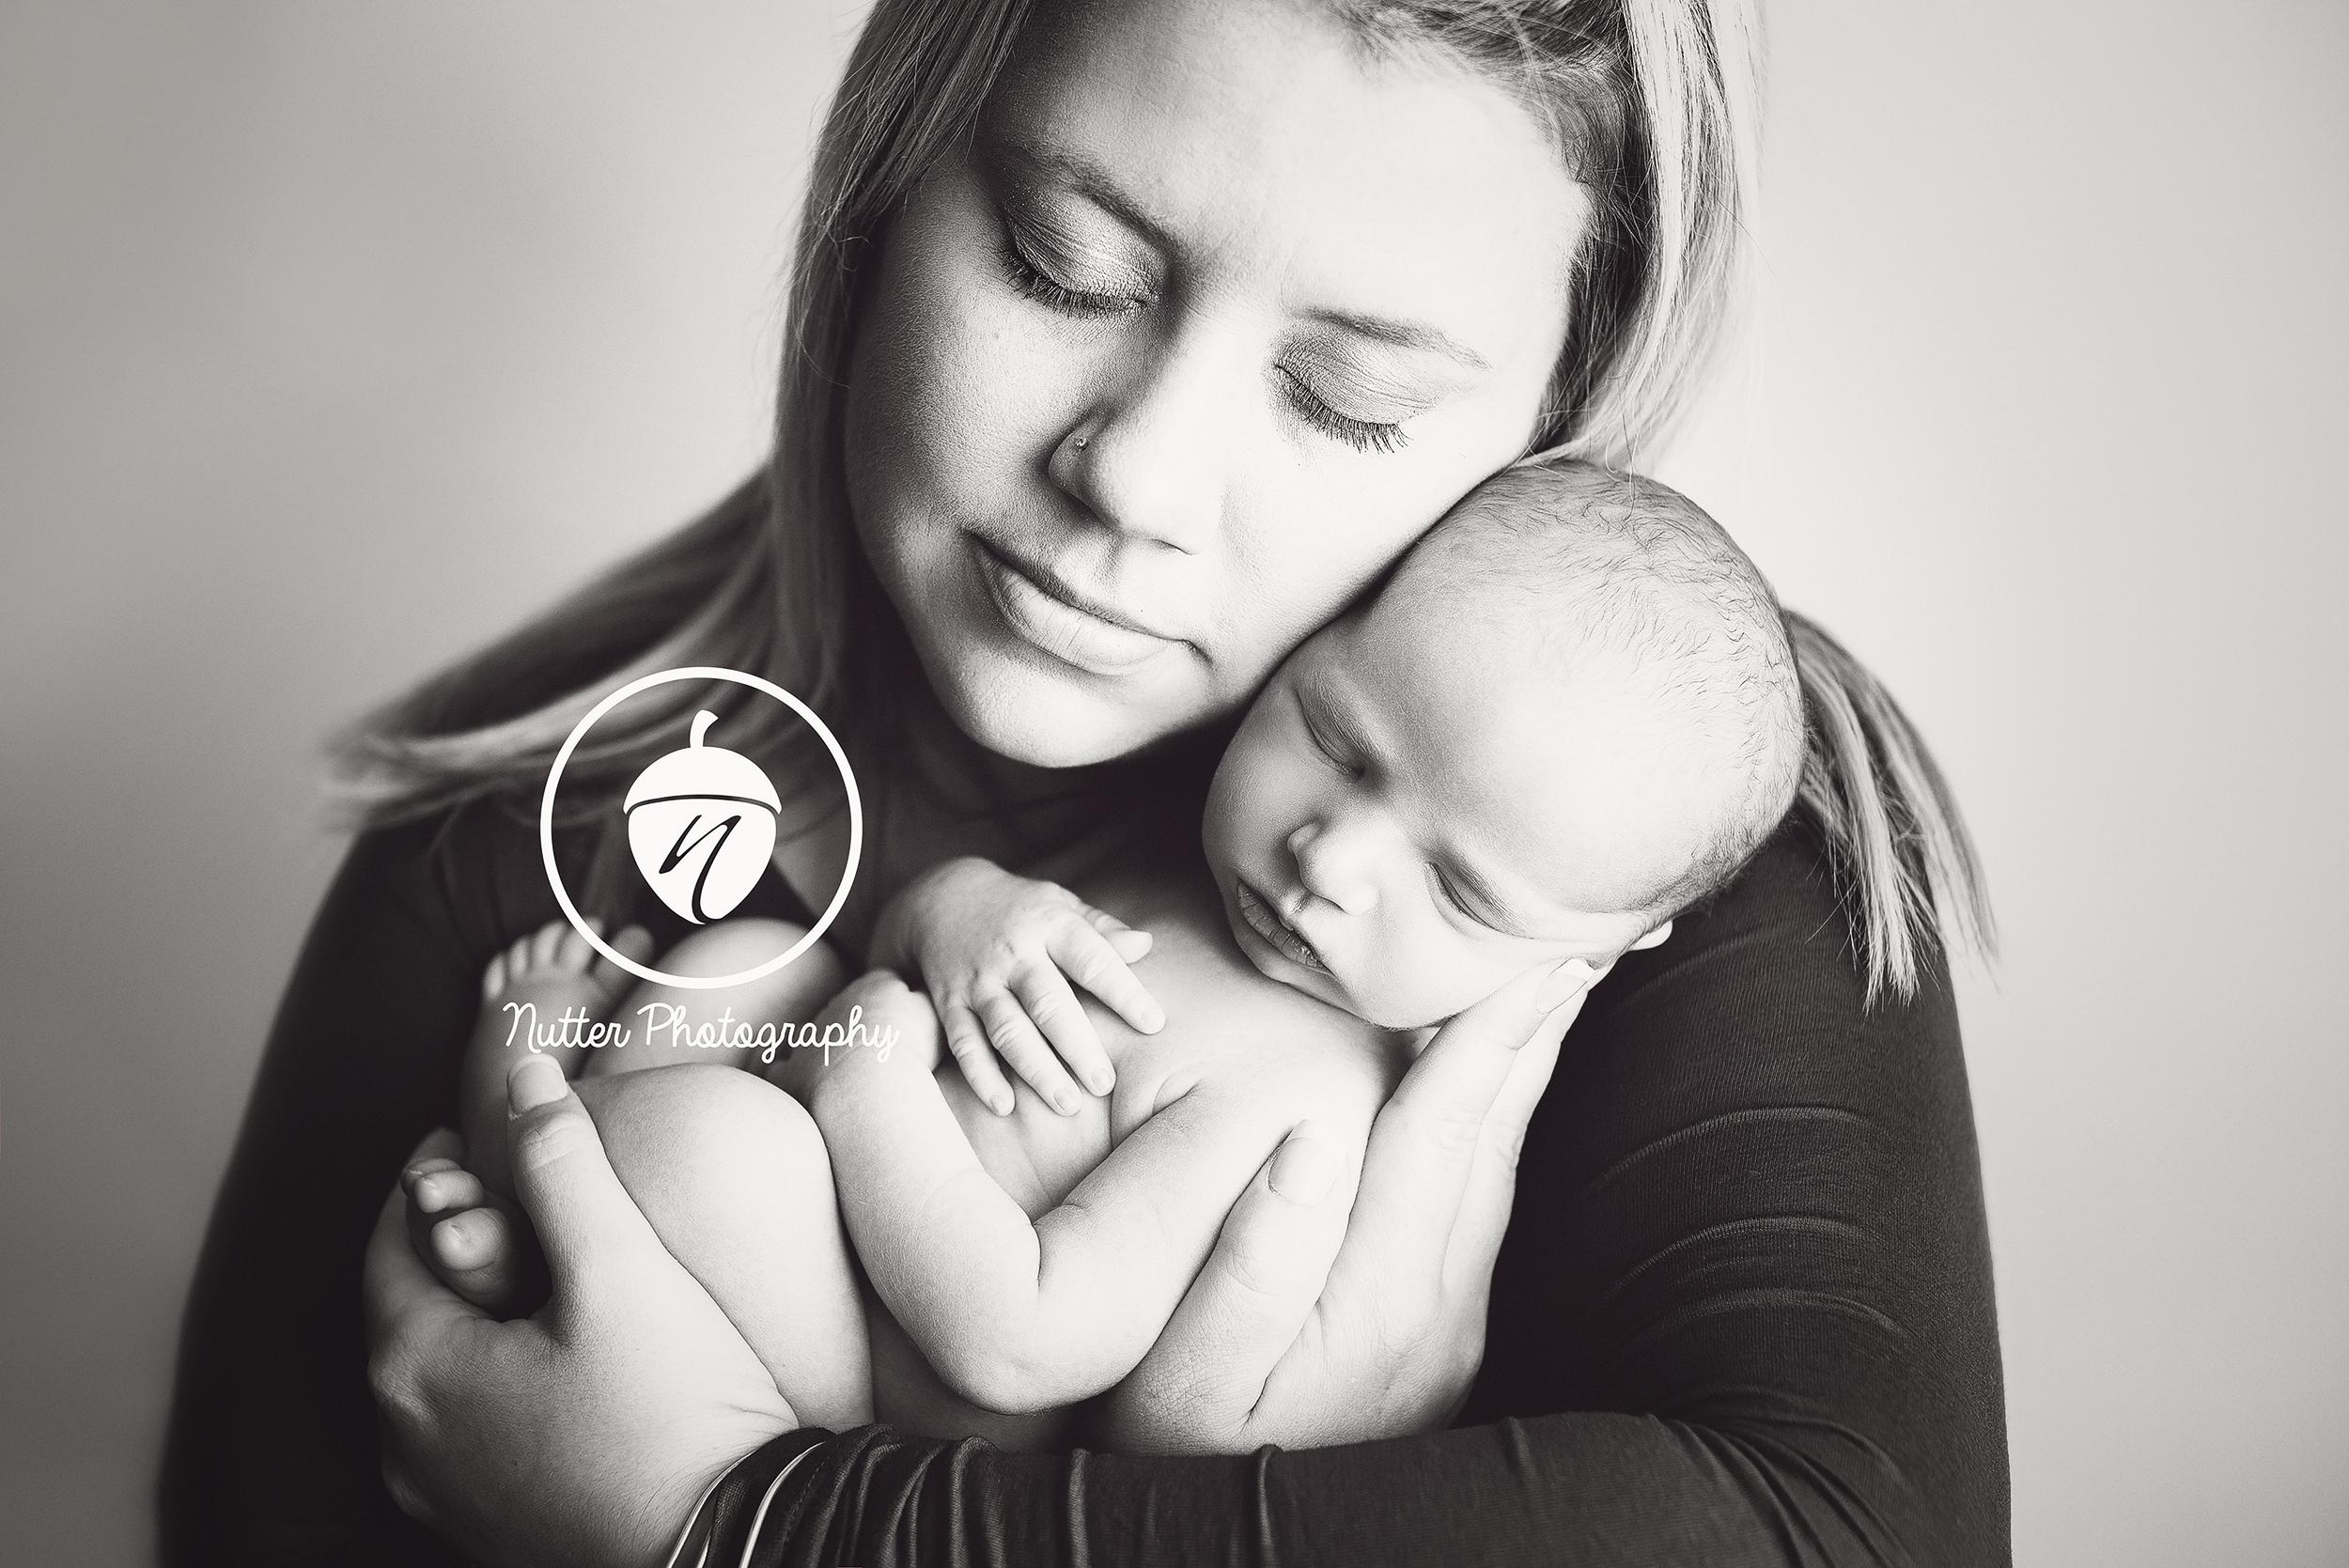 newborn baby with mom